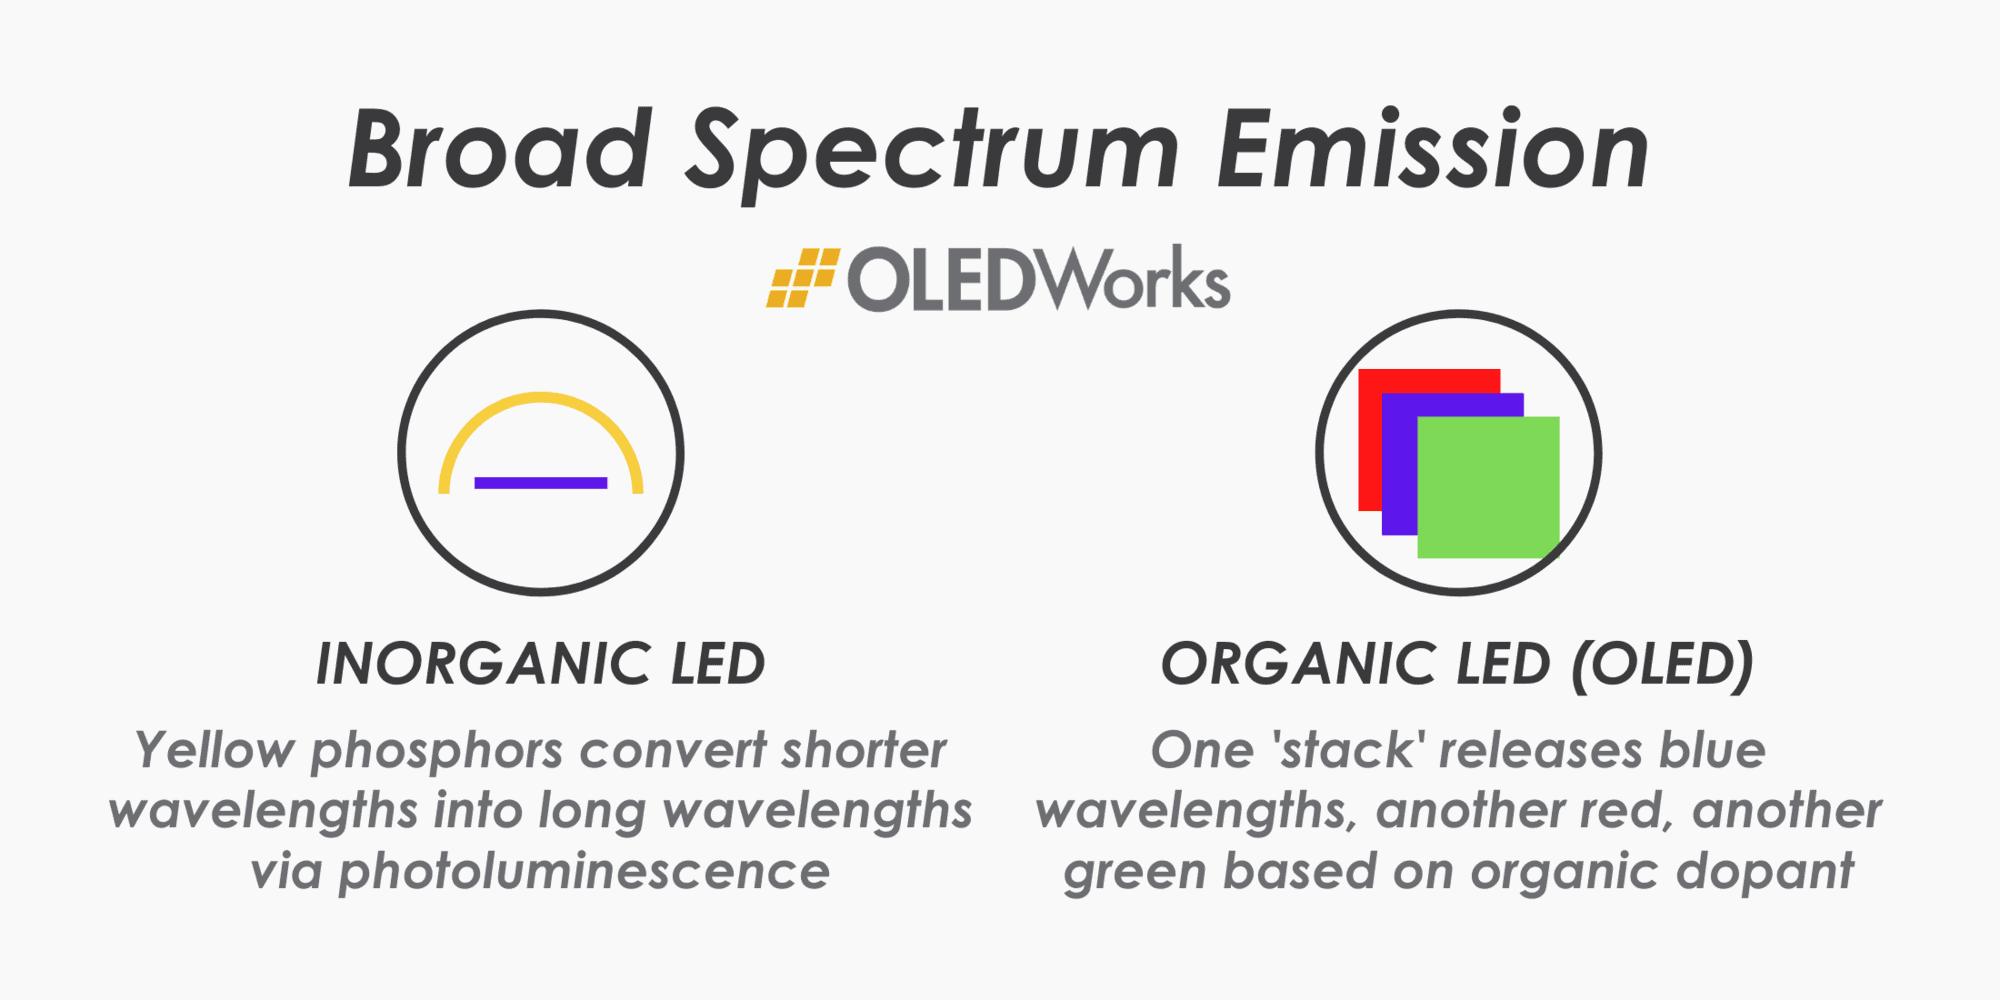 OLED and LED Broad Spectrum Emission